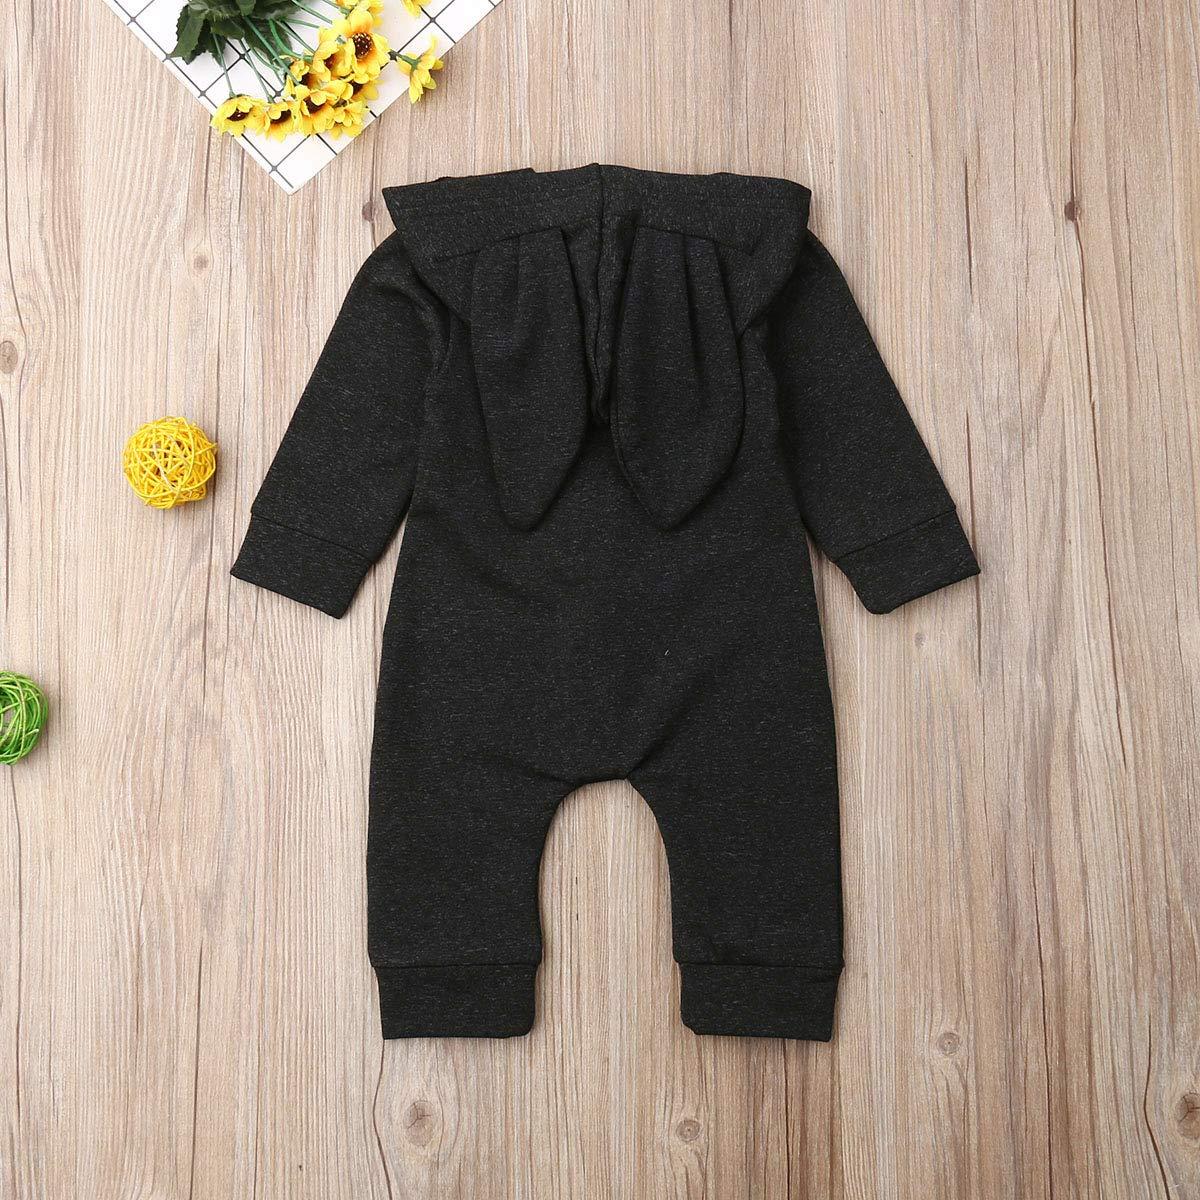 CIPOGL Neugeborenes Baby M/ädchen Jungen Strampler 3D Ohren mit Kapuze Einfarbig Strampler Overall Outfits Unisex Baby Kleidung Set